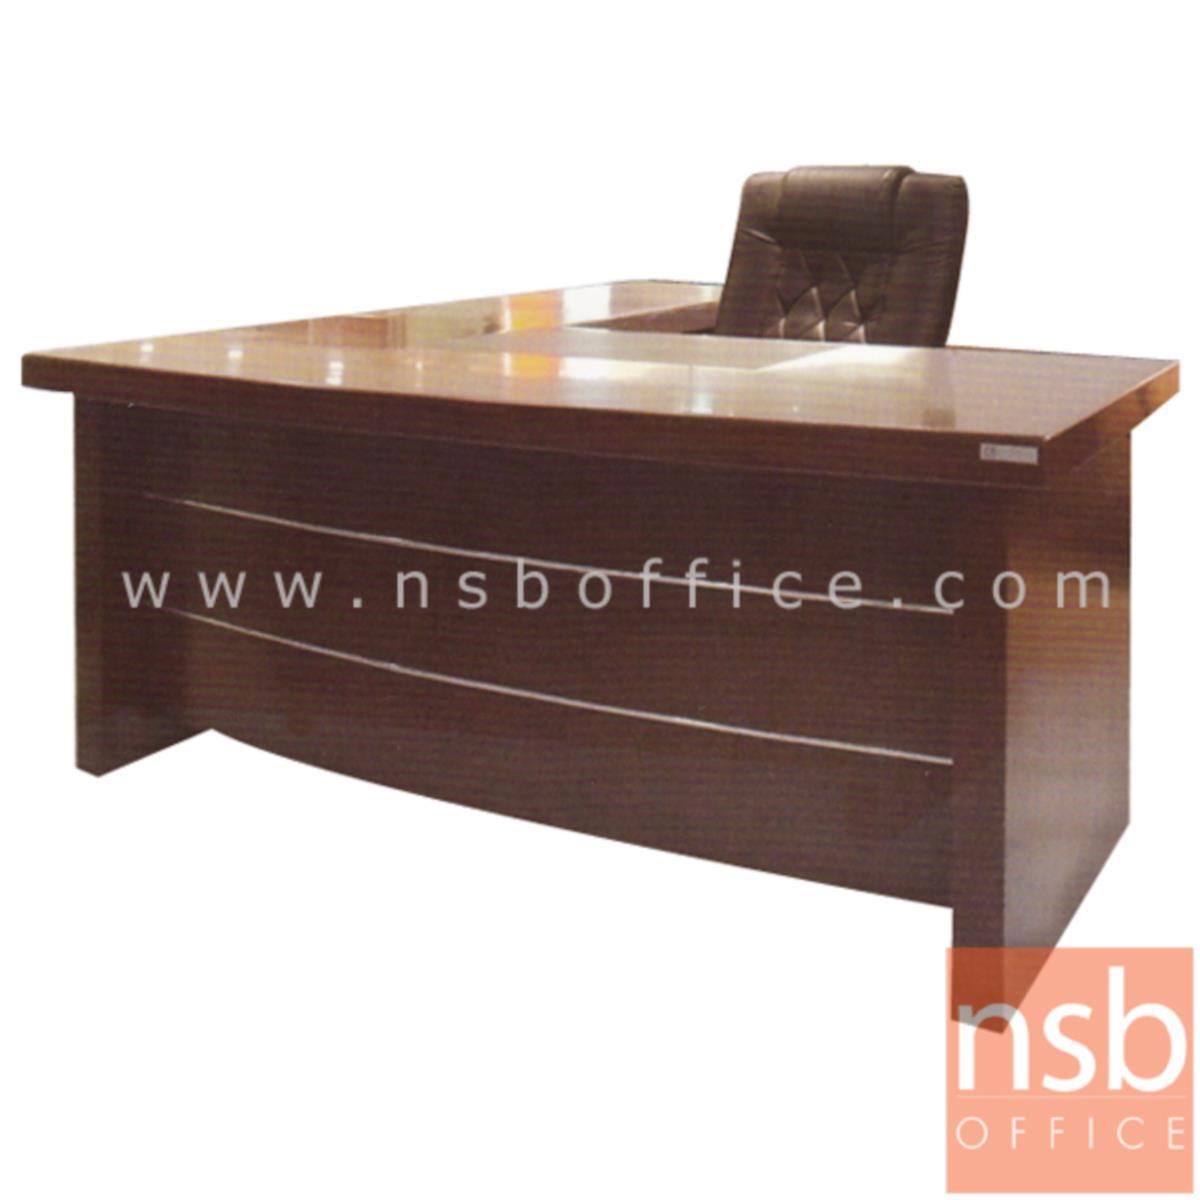 A06A056:โต๊ะผู้บริหารตัวแอล  รุ่น Hutcherson (ฮัทเชอร์สัน) ขนาด 160W cm. พร้อมตู้ข้างและตู้ลิ้นชัก